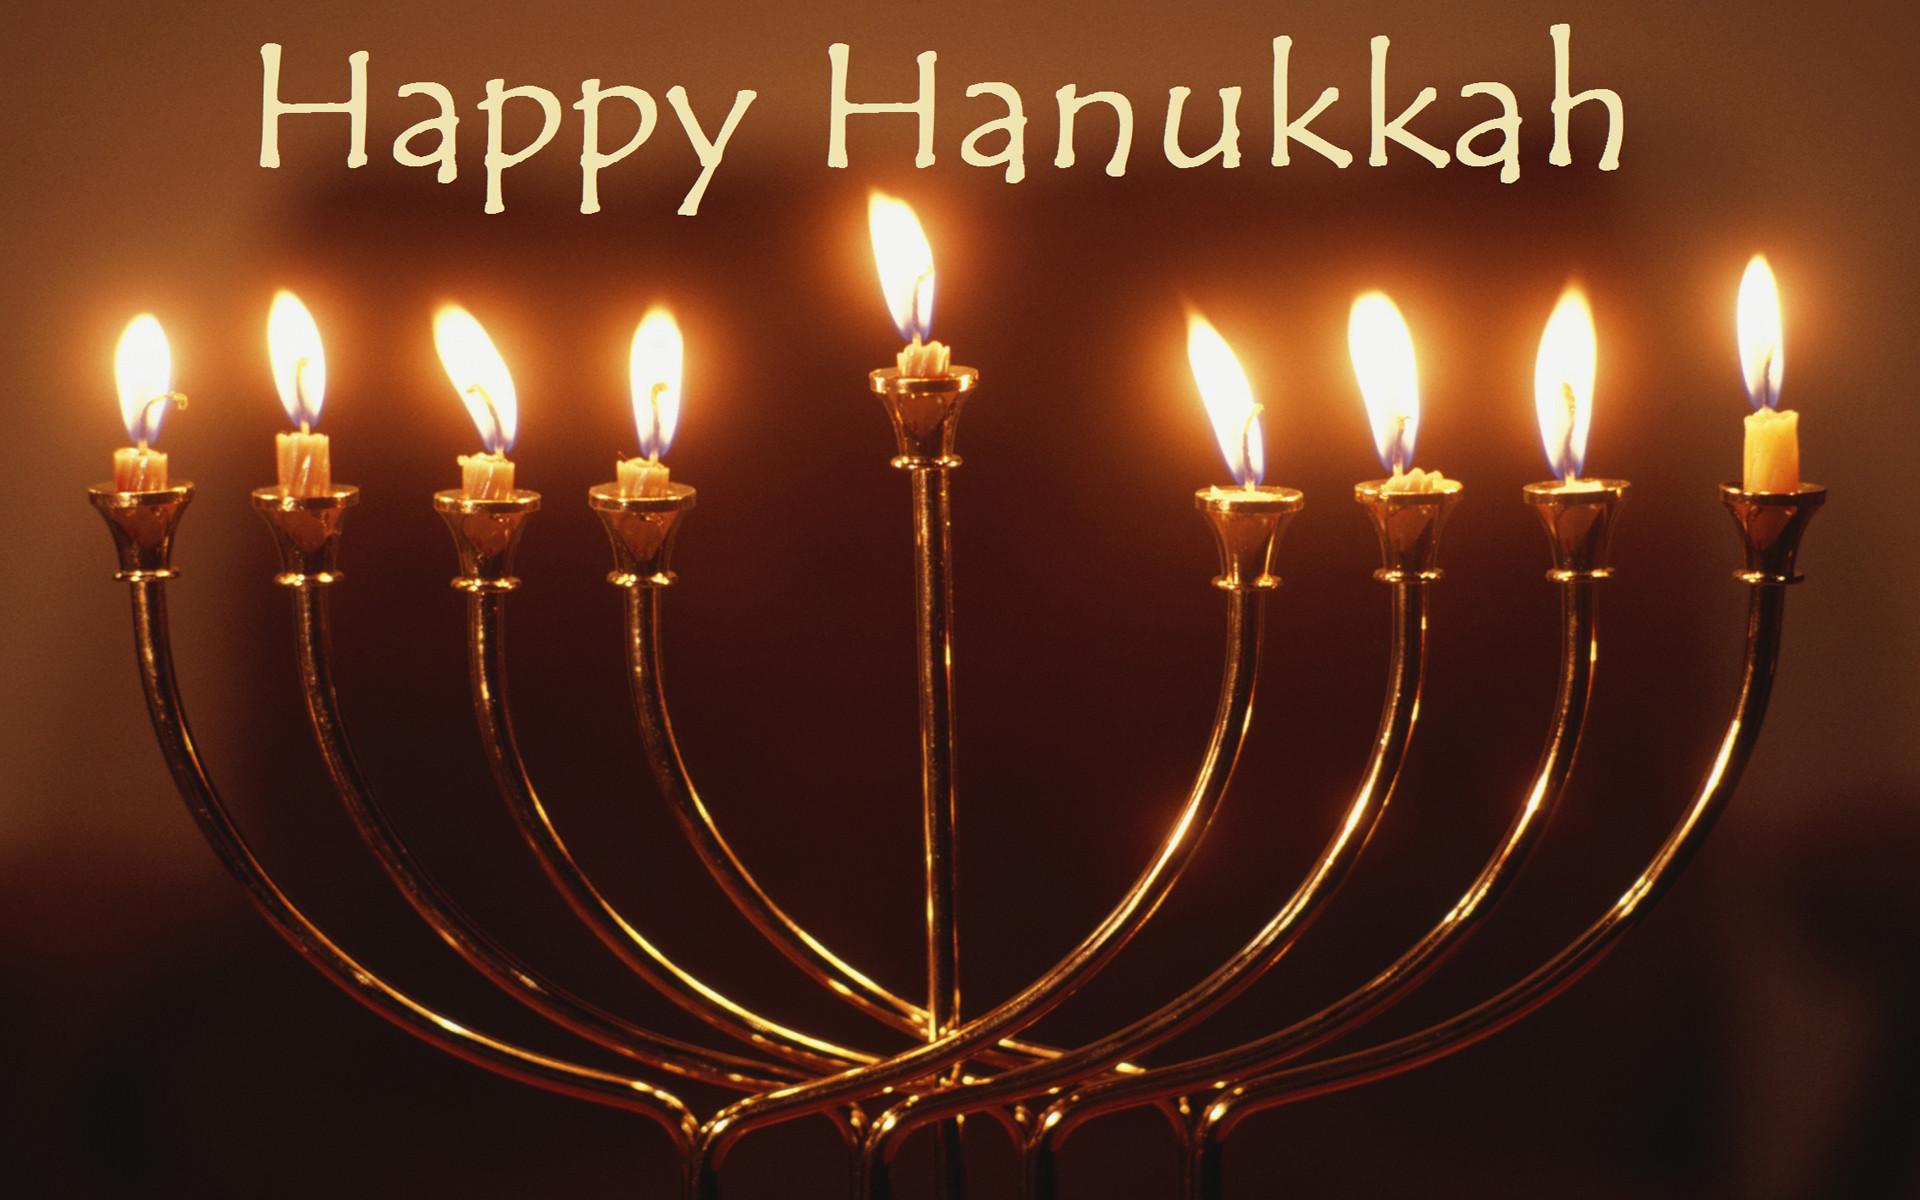 Happy Hanukkah 2014 background hd wallpaper, background desktop .